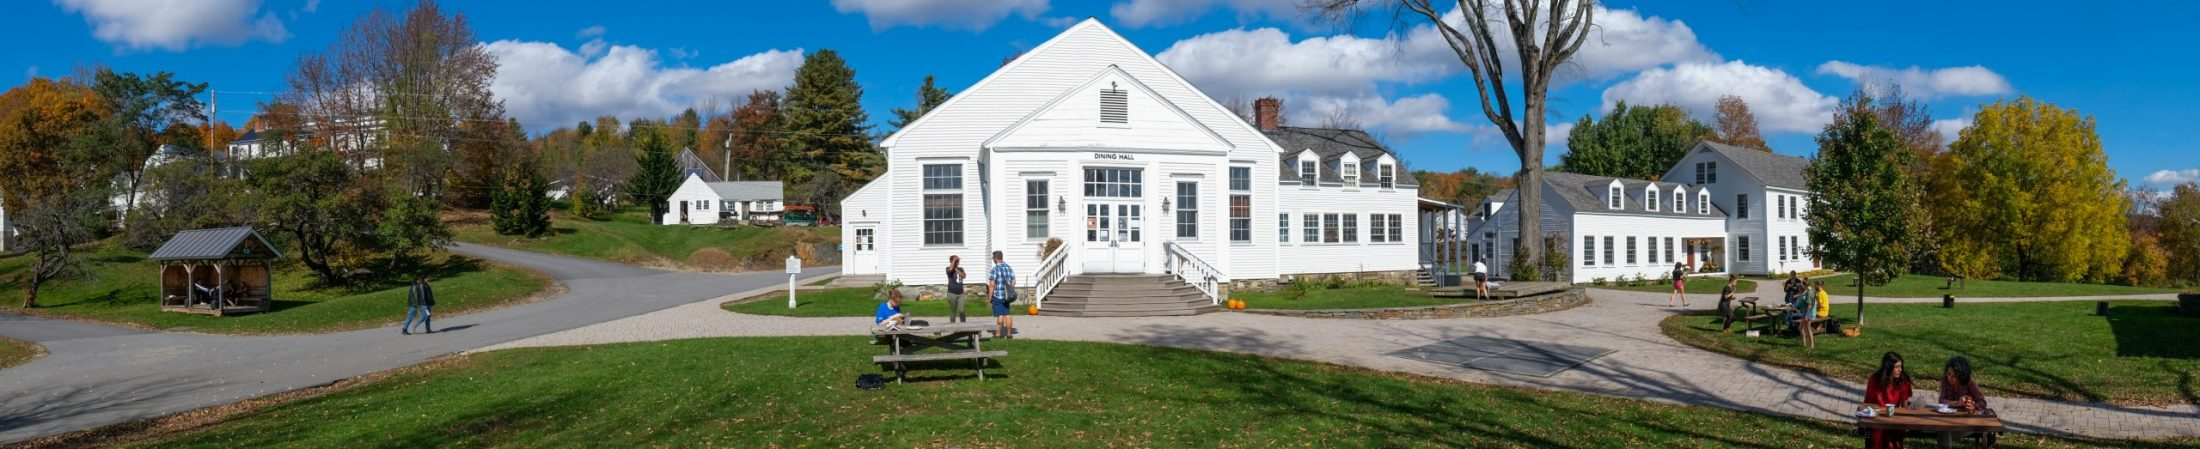 Marlboro College Archives